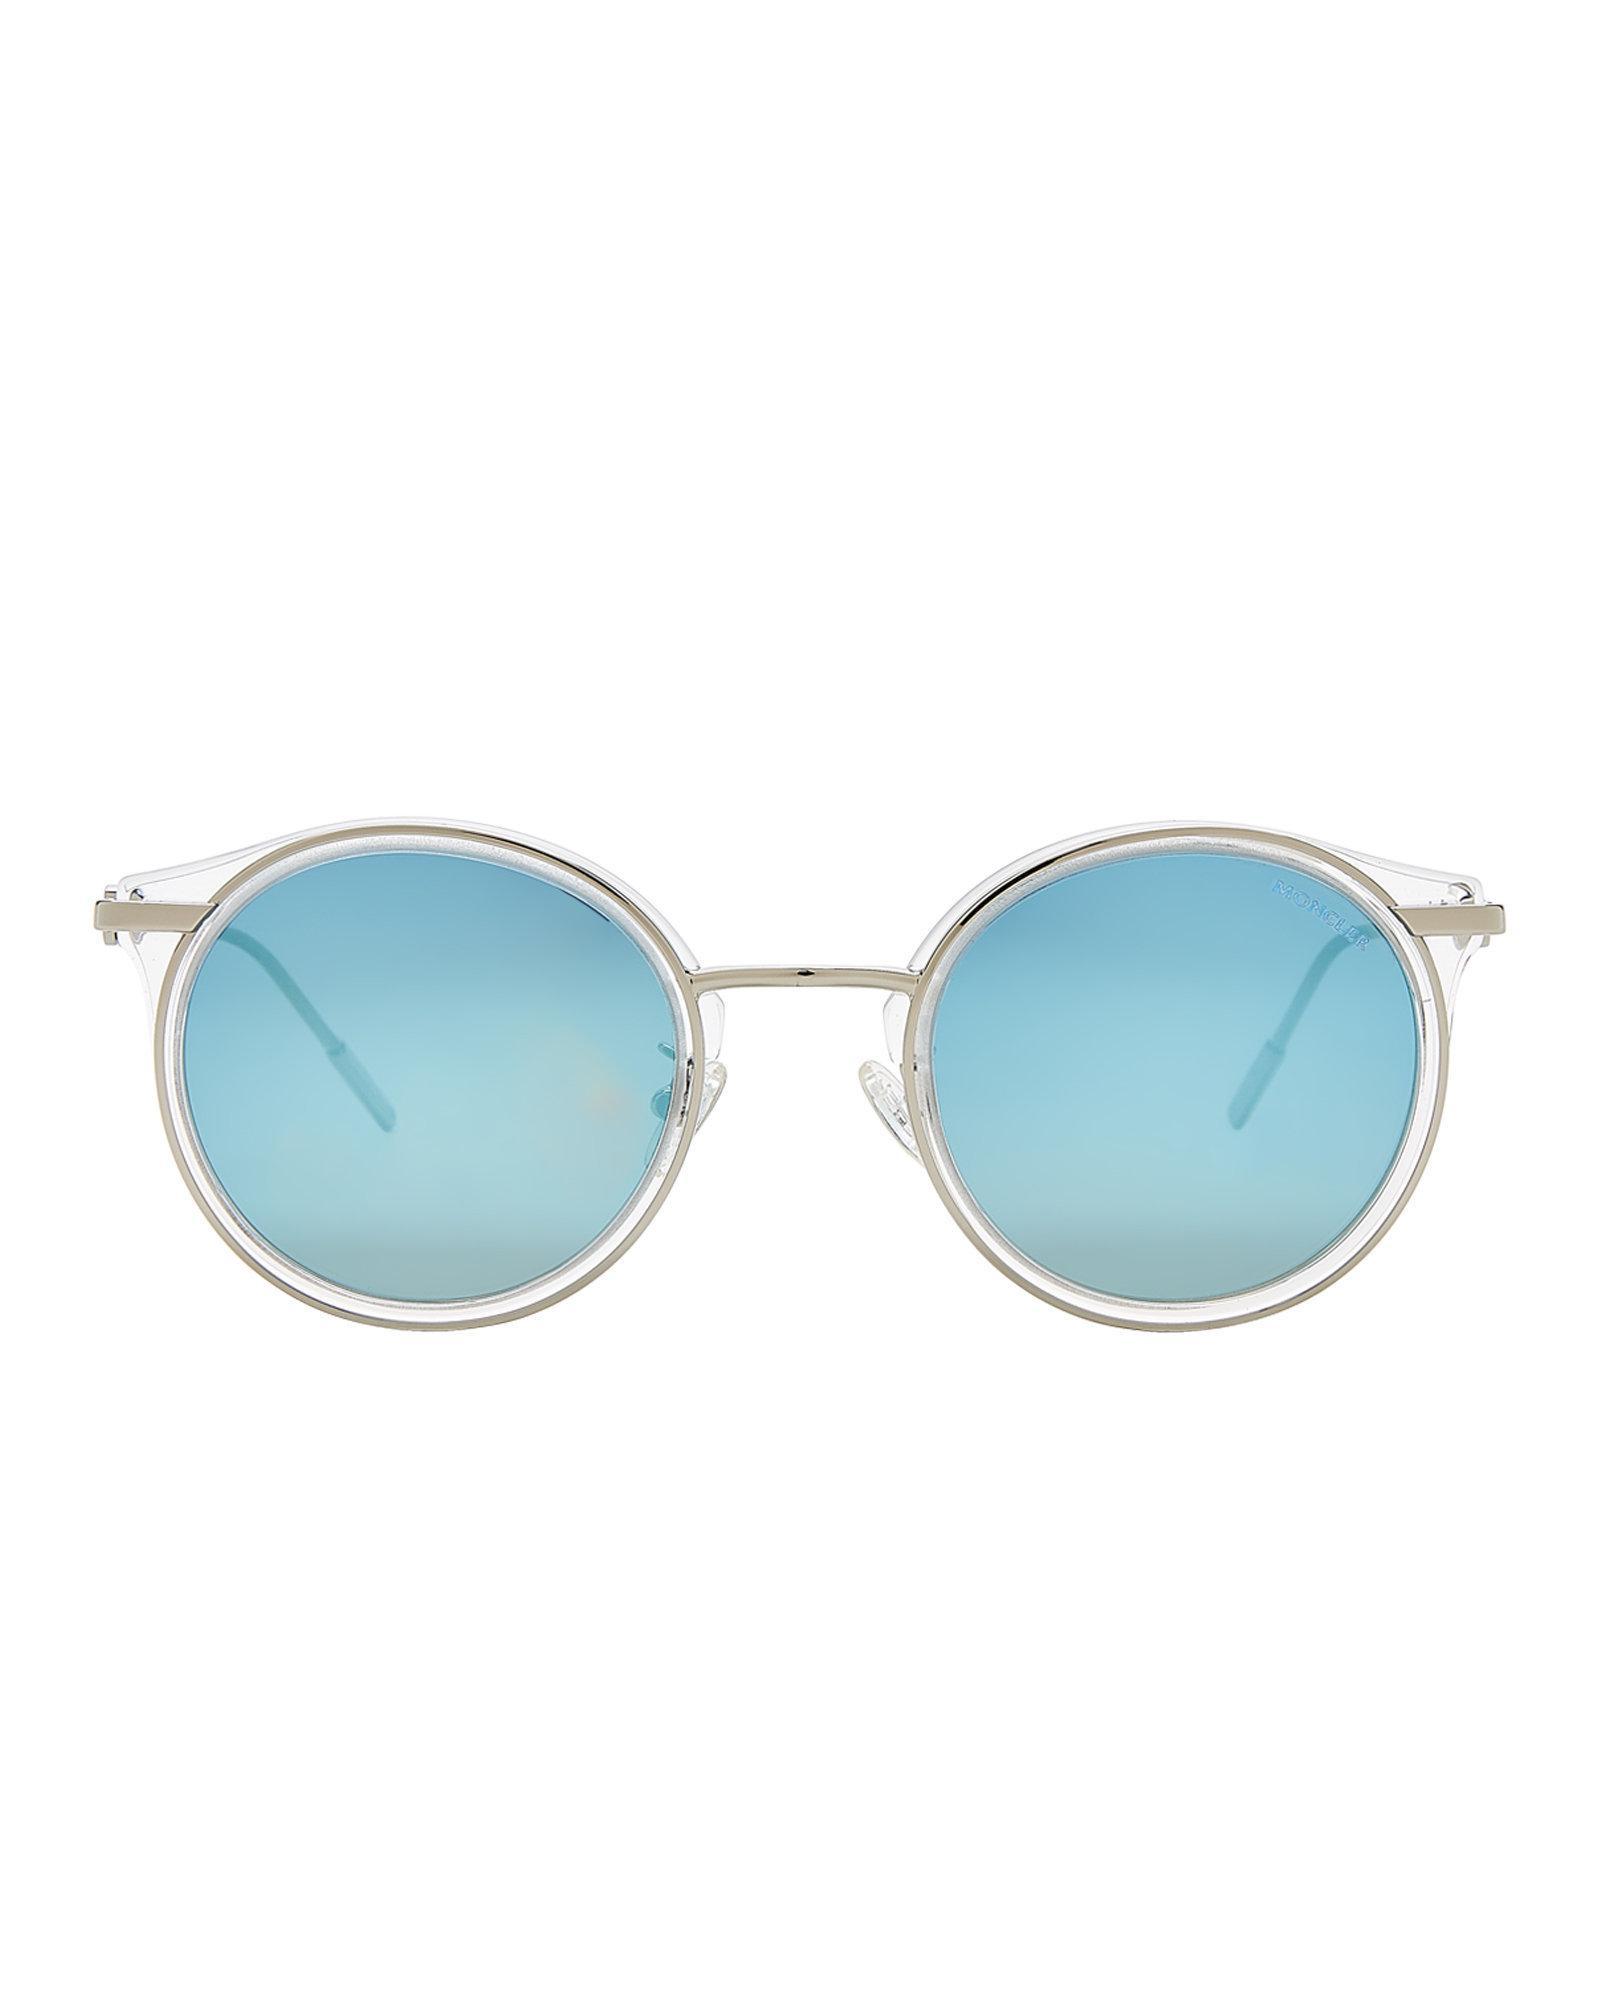 K Sunglasses Silver Tone Ml0023 In Moncler Round amp; Lyst Blue qZx8EnUU